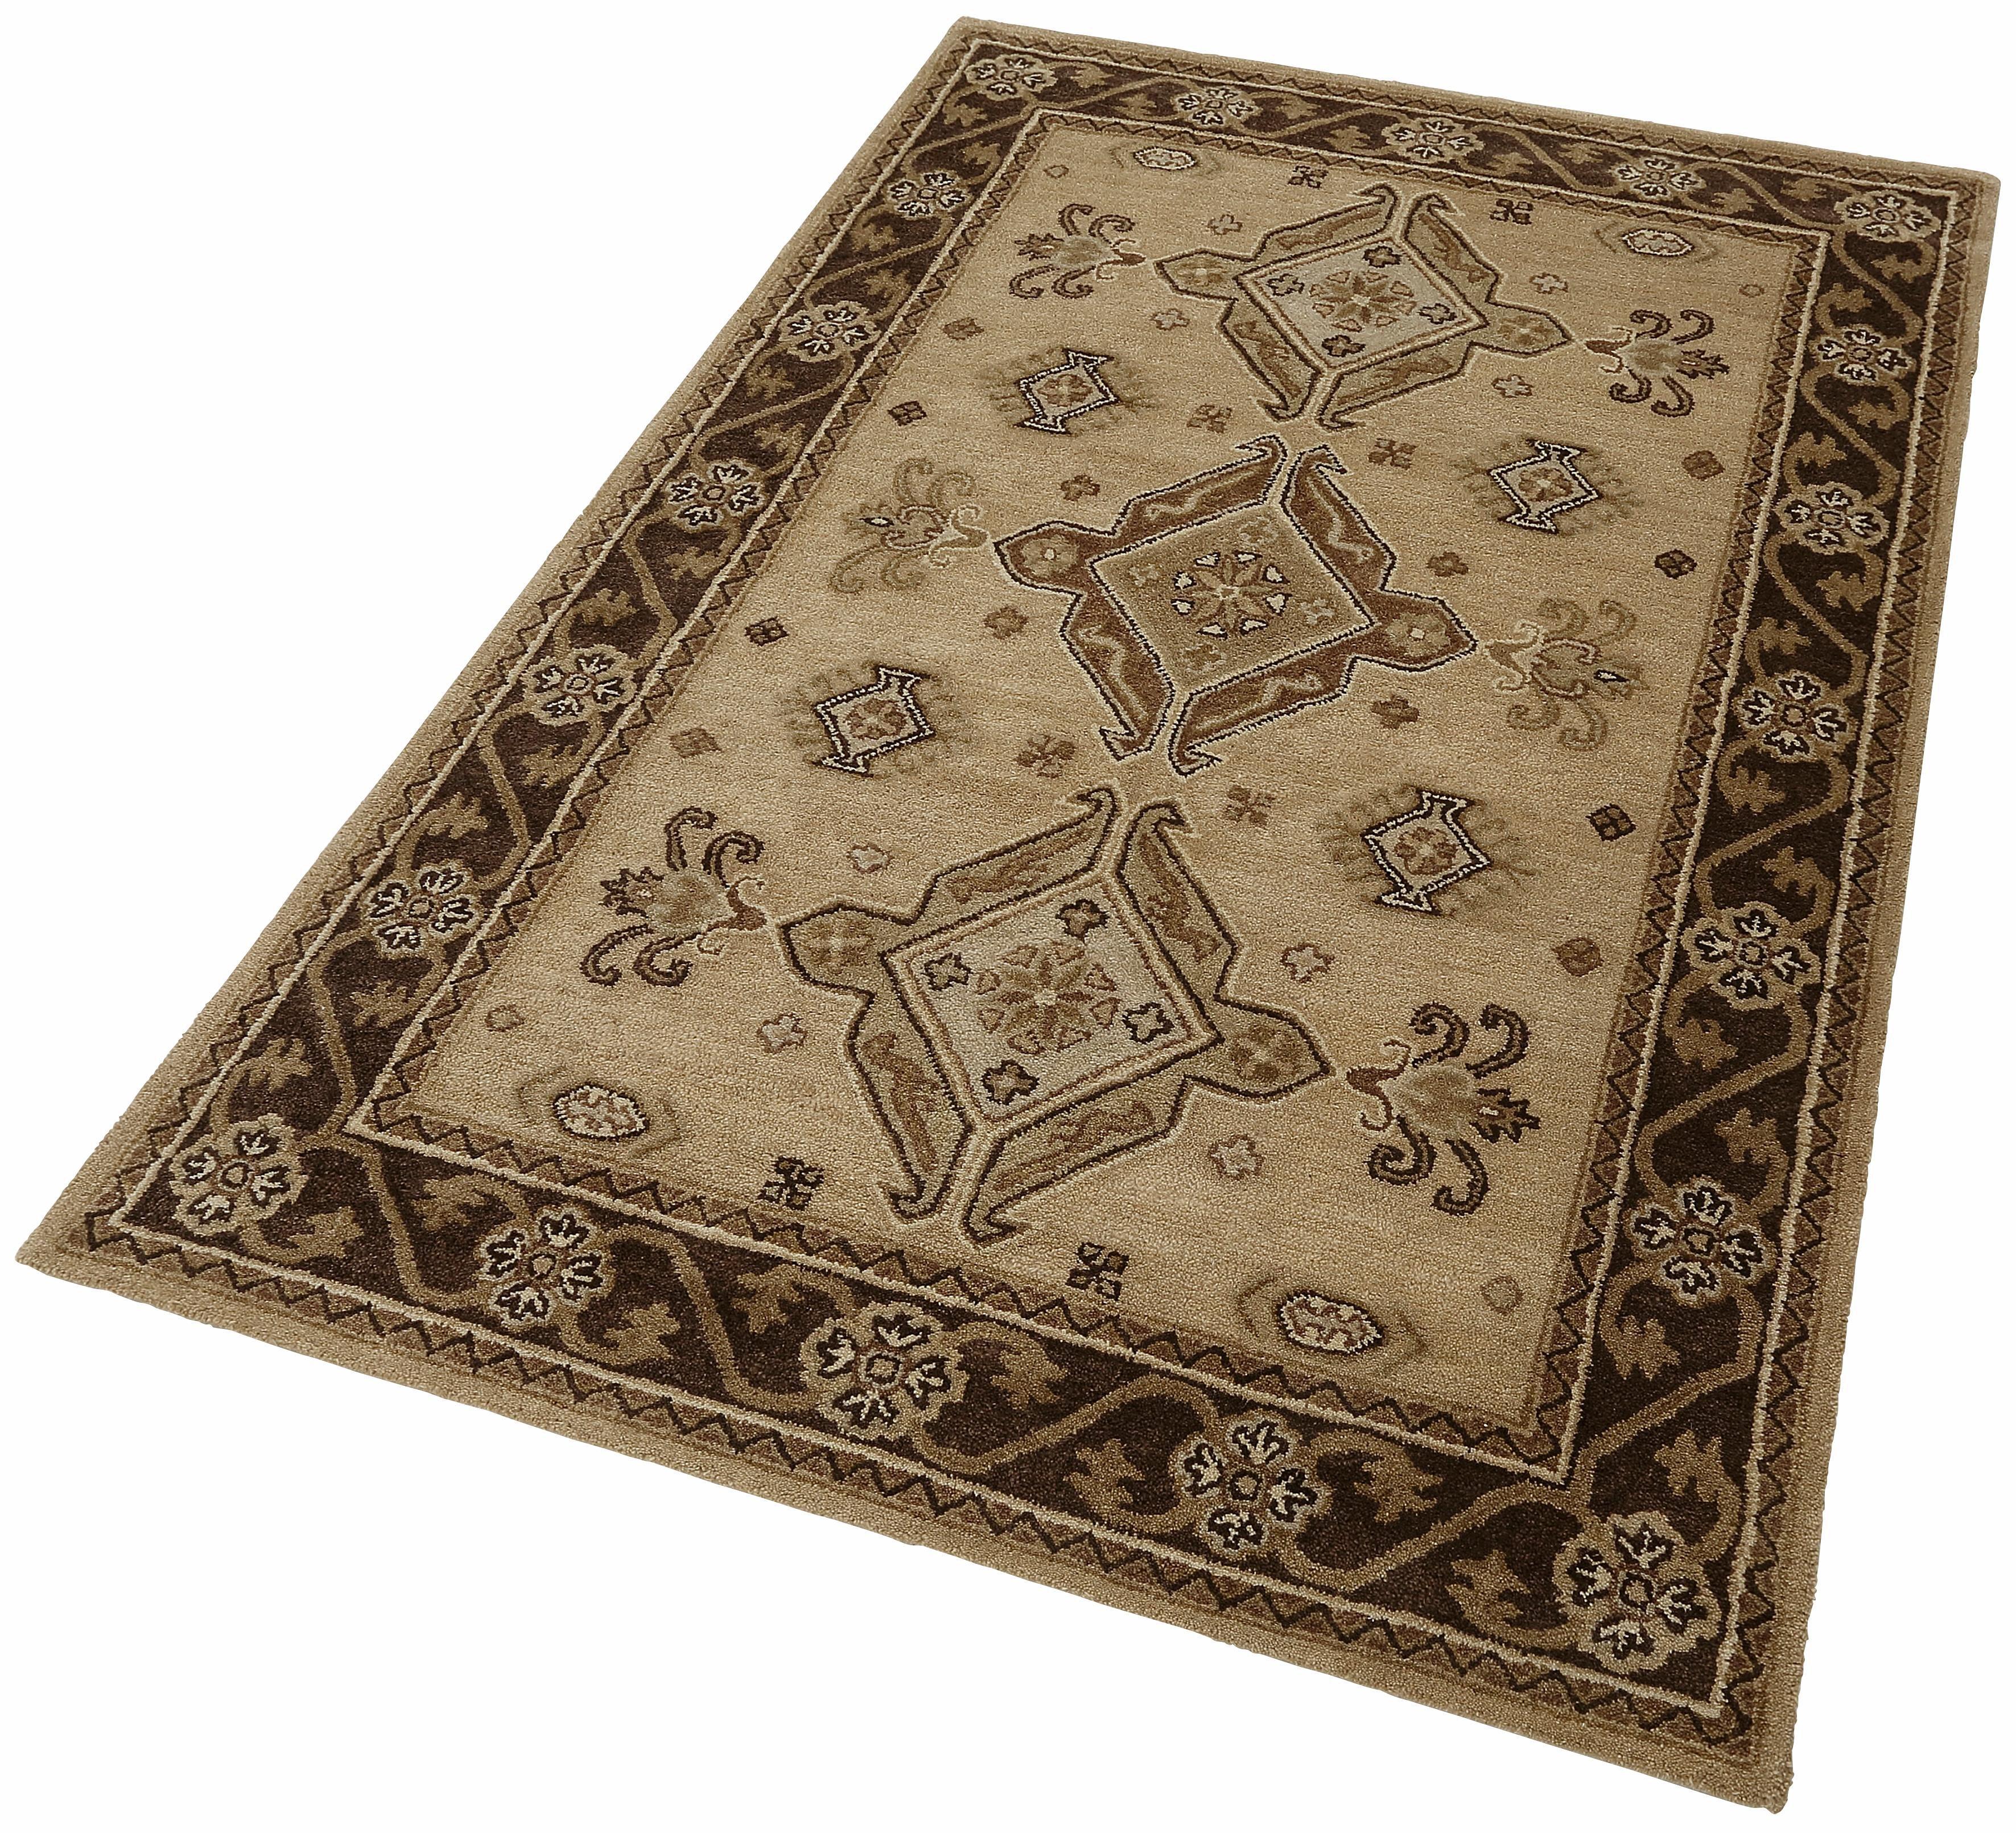 Orientteppich »Royal Kazak«, THEKO, rechteckig, Höhe 14 mm | Heimtextilien > Teppiche > Orientteppiche | Wolle | THEKO